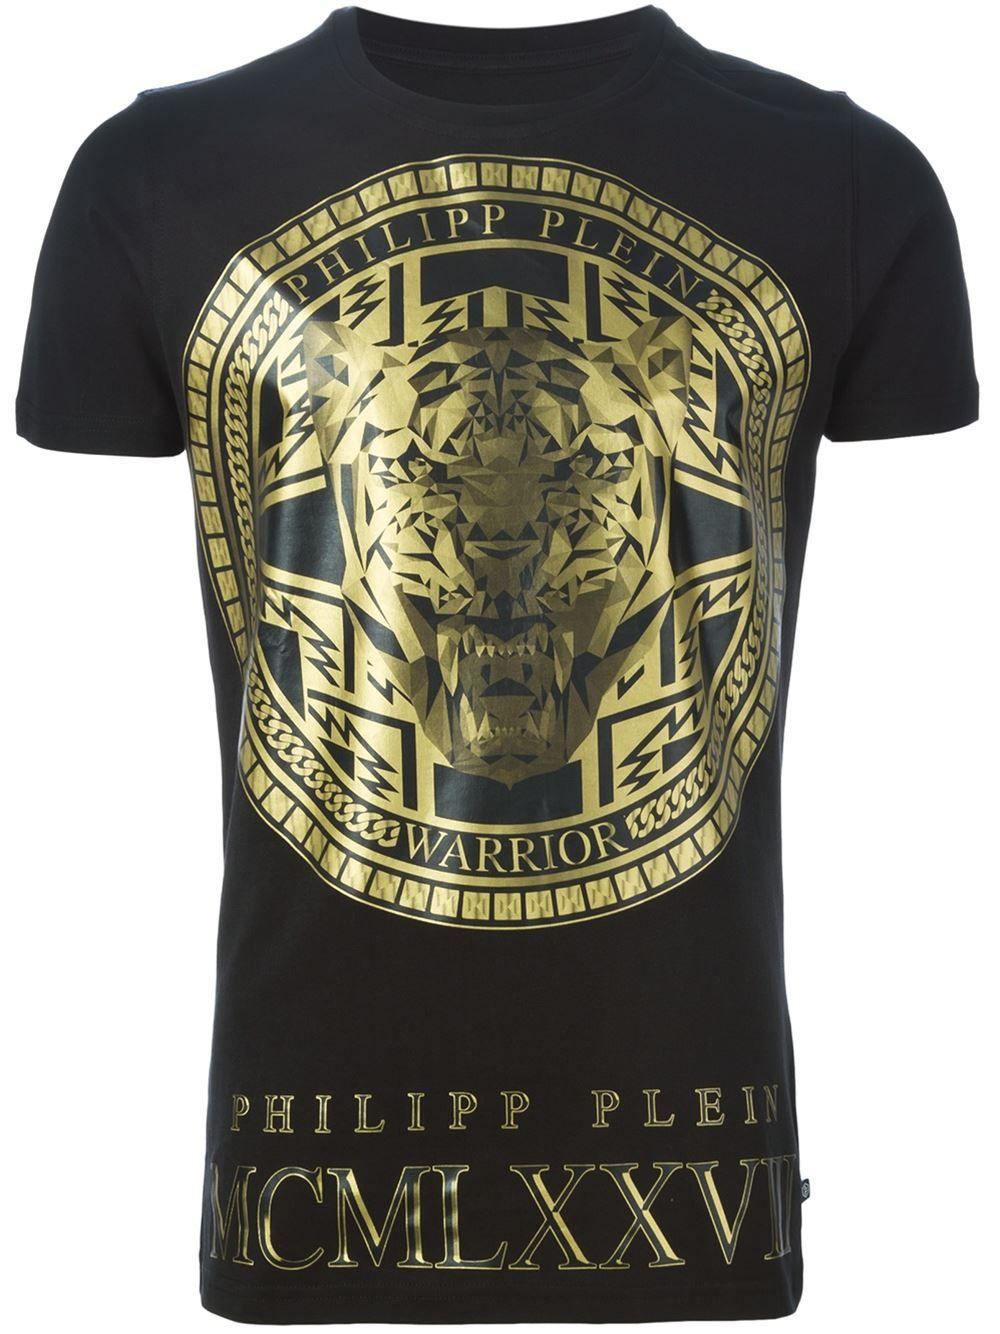 8084d20a0b Philipp Plein 'medallion' T-shirt - Wellens Men - Farfetch.com ...